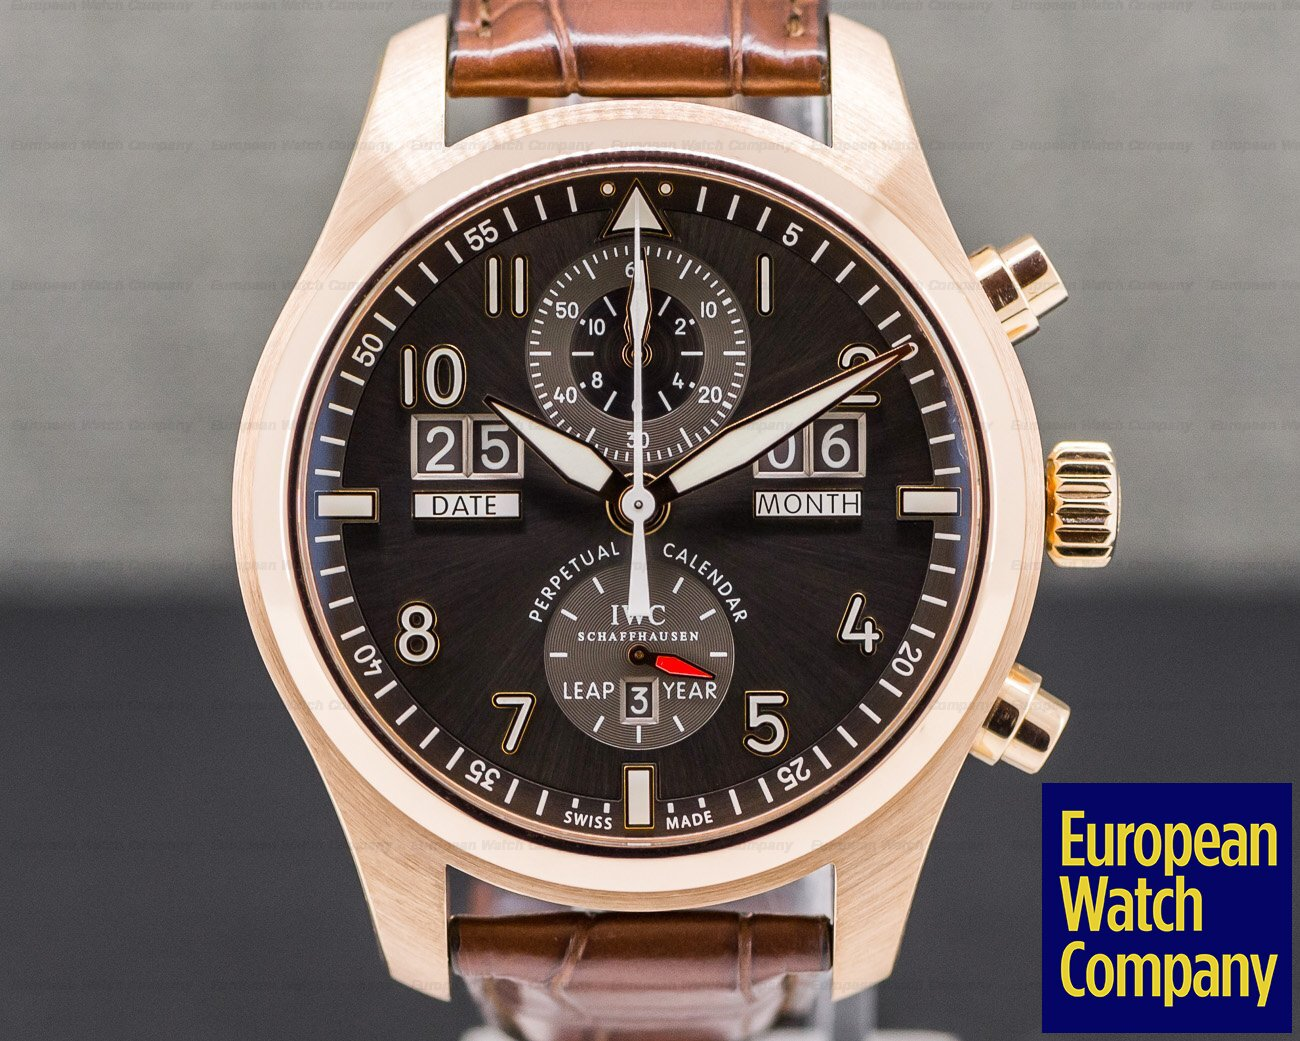 IWC IW379103 Pilot Spitfire Perpetual Calendar Digital Date 18K Rose Gold